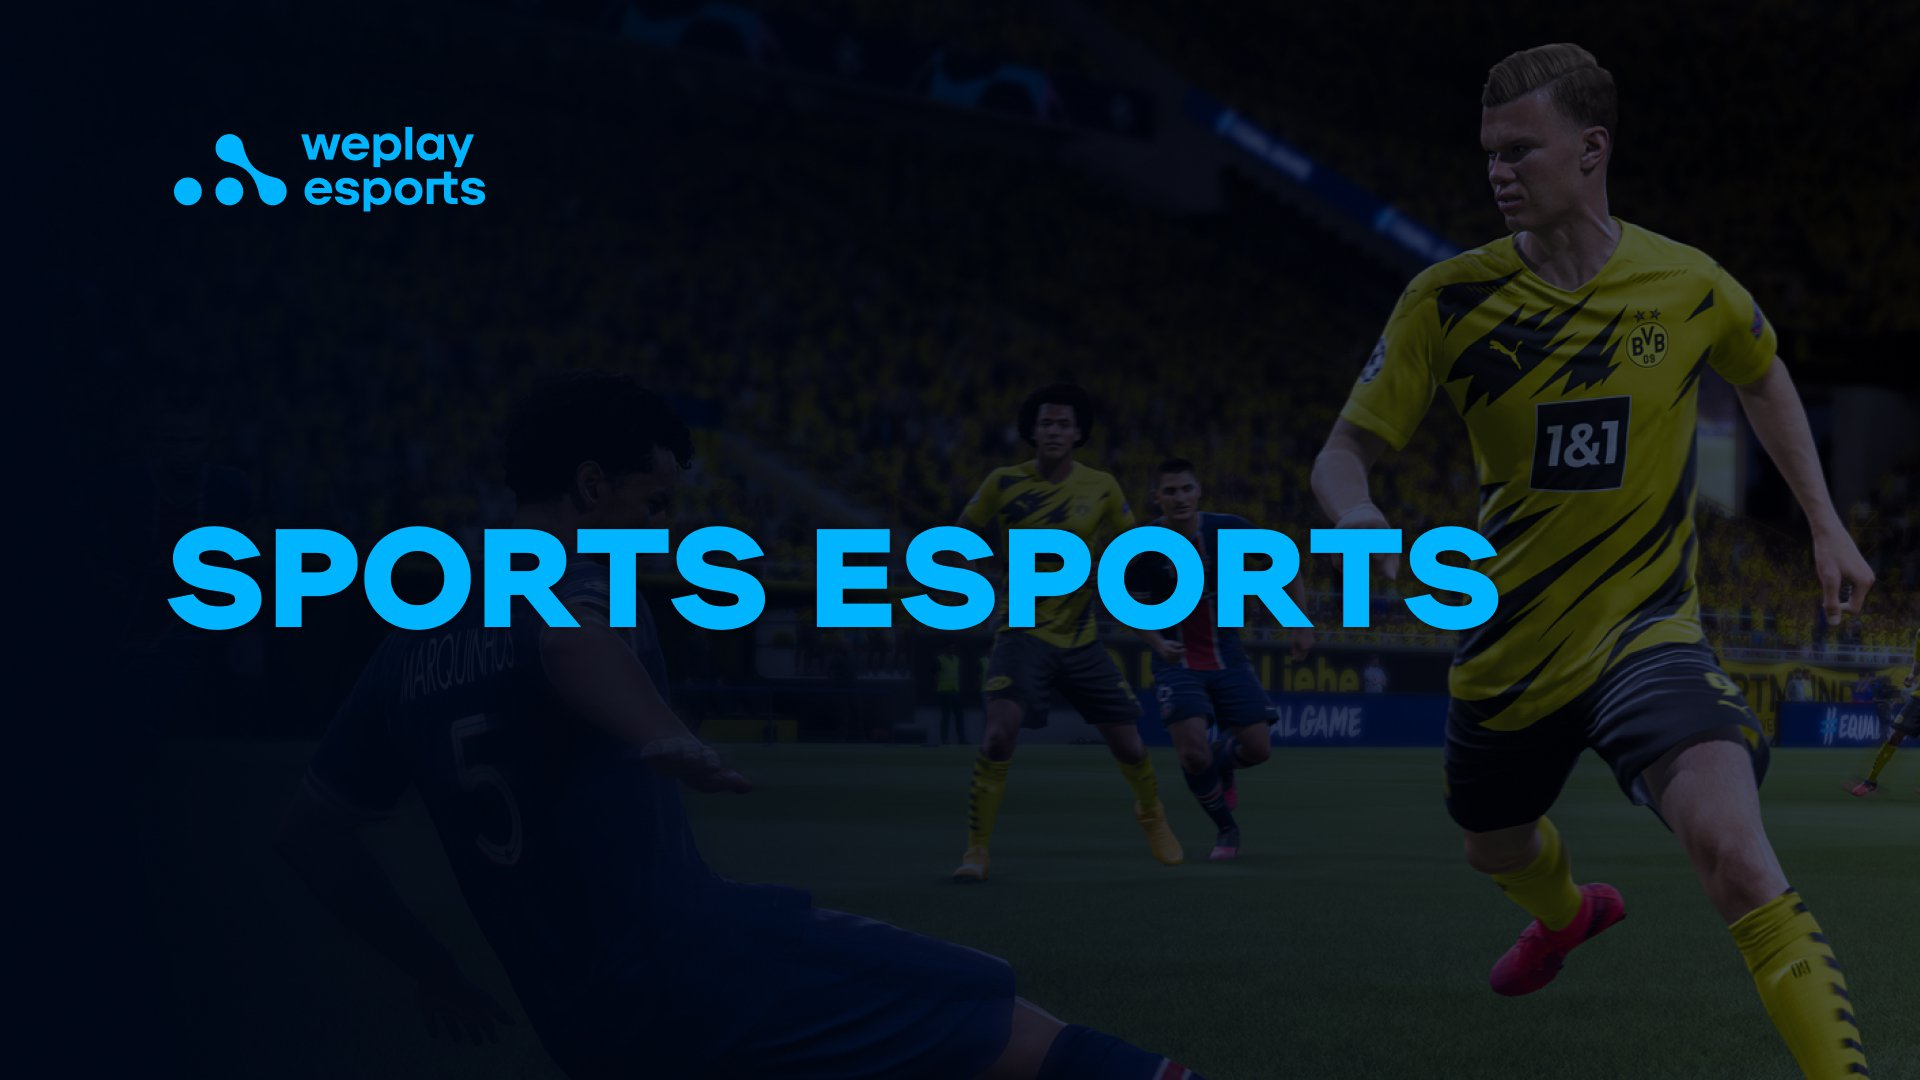 Sports Esports